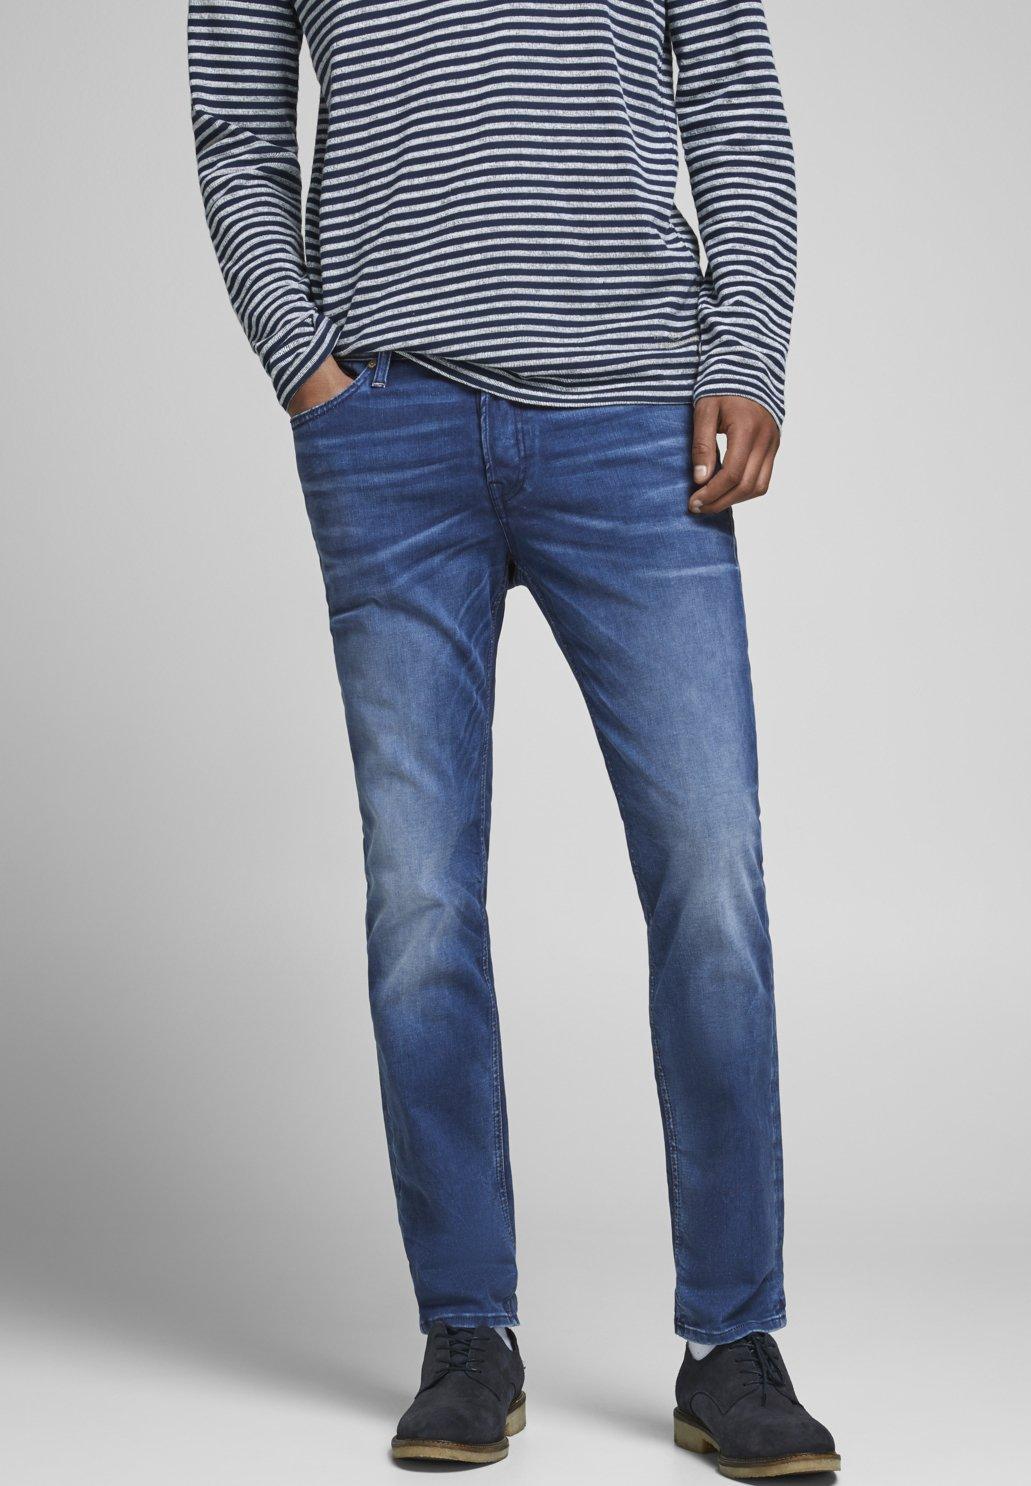 Uomo JJJJITIM JJORIGINAL - Jeans slim fit